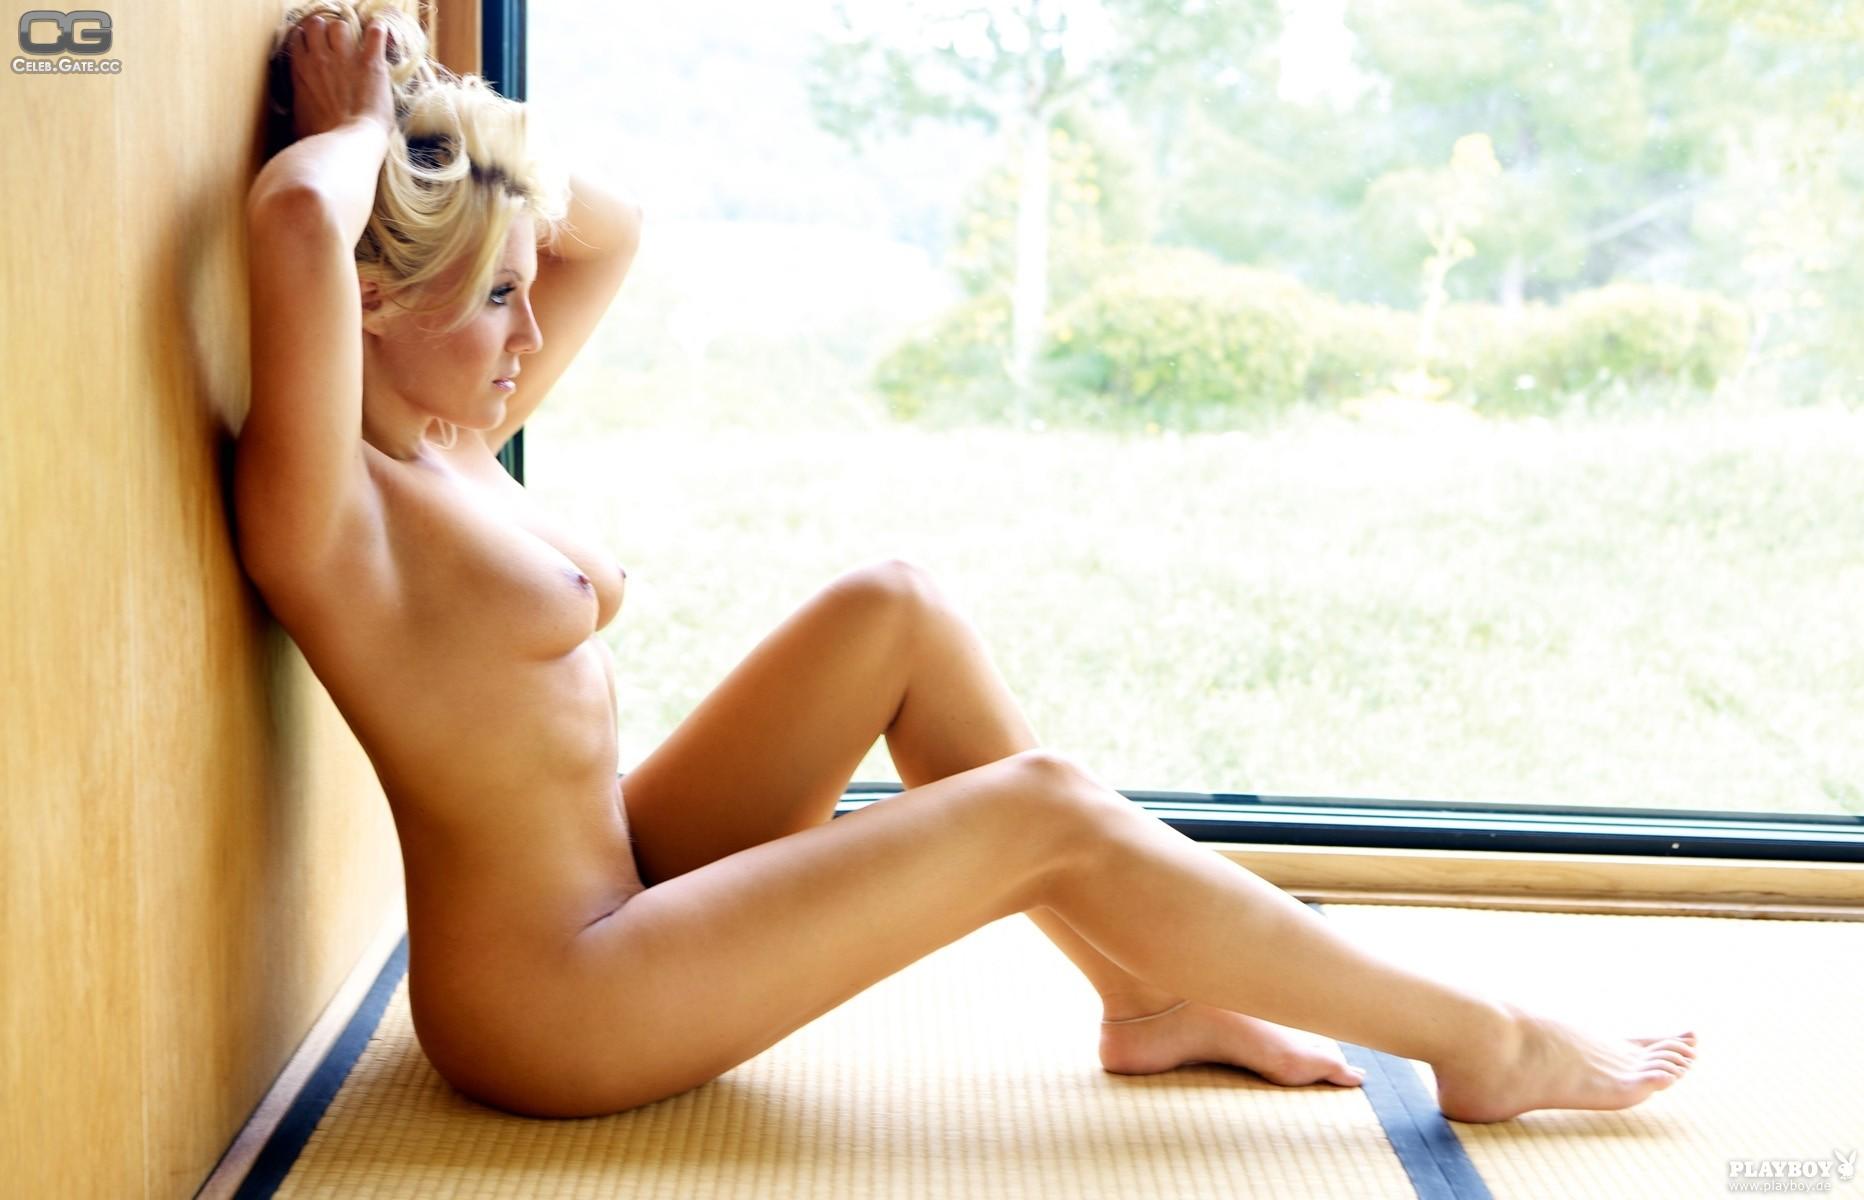 Serena williams naked photo